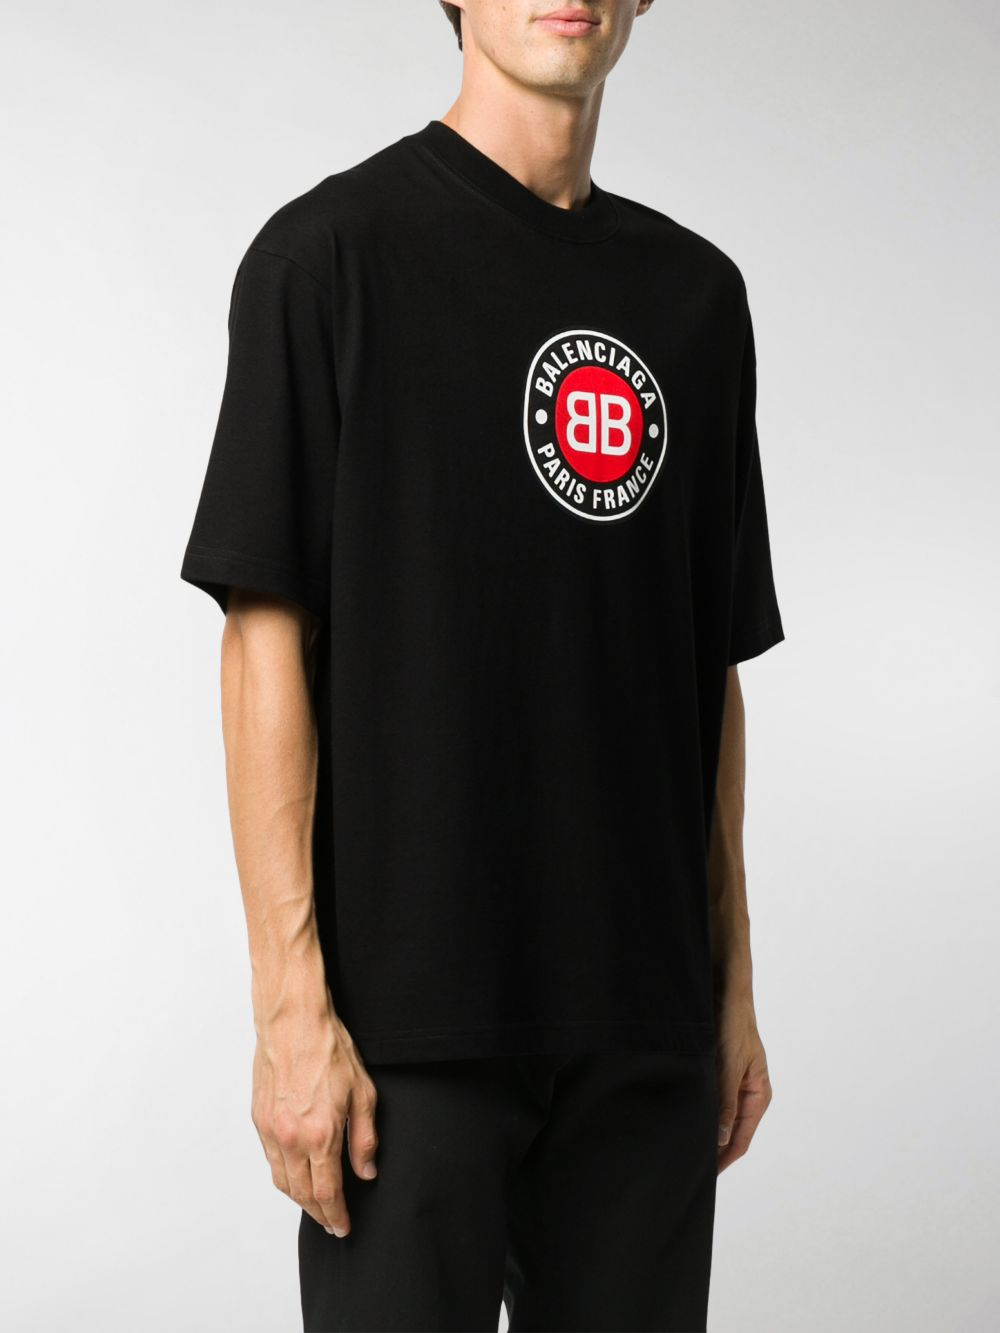 Black cotton relaxed-fit t-shirt featuring circular Balenciaga Paris logo print  BALENCIAGA      612966-TJVD61000